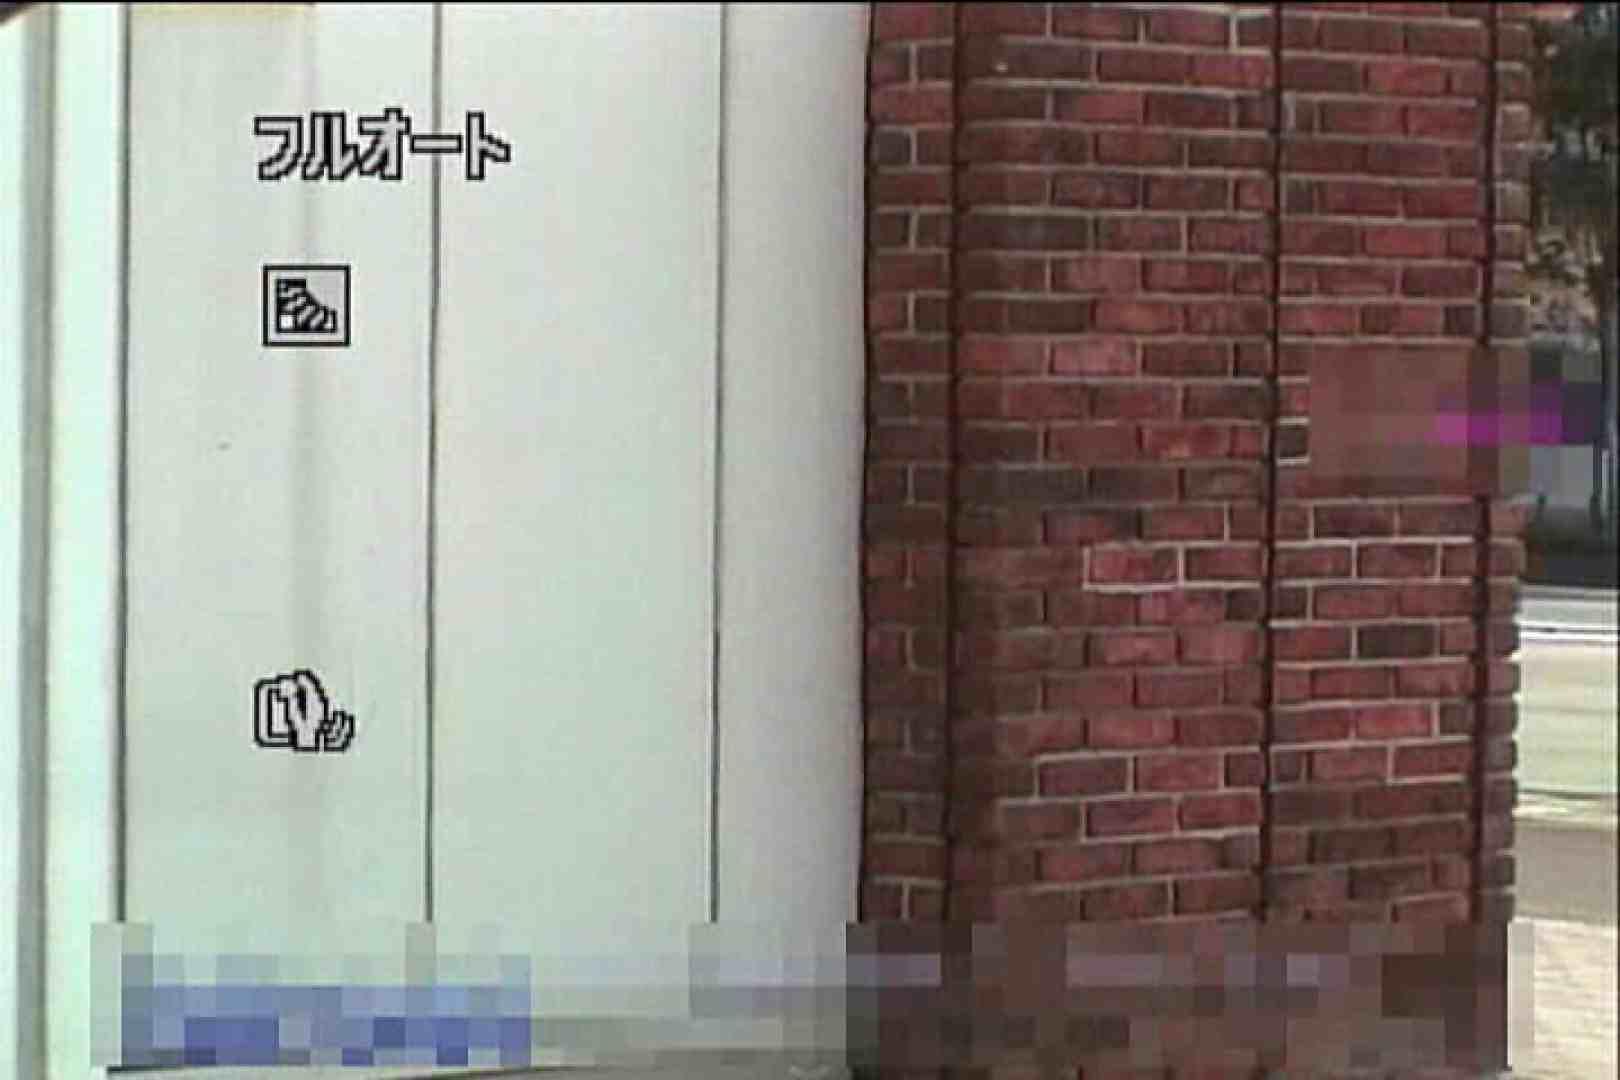 2点盗撮洗面所潜入レポートVol.6 OLヌード天国 | 洗面所  107PIX 86